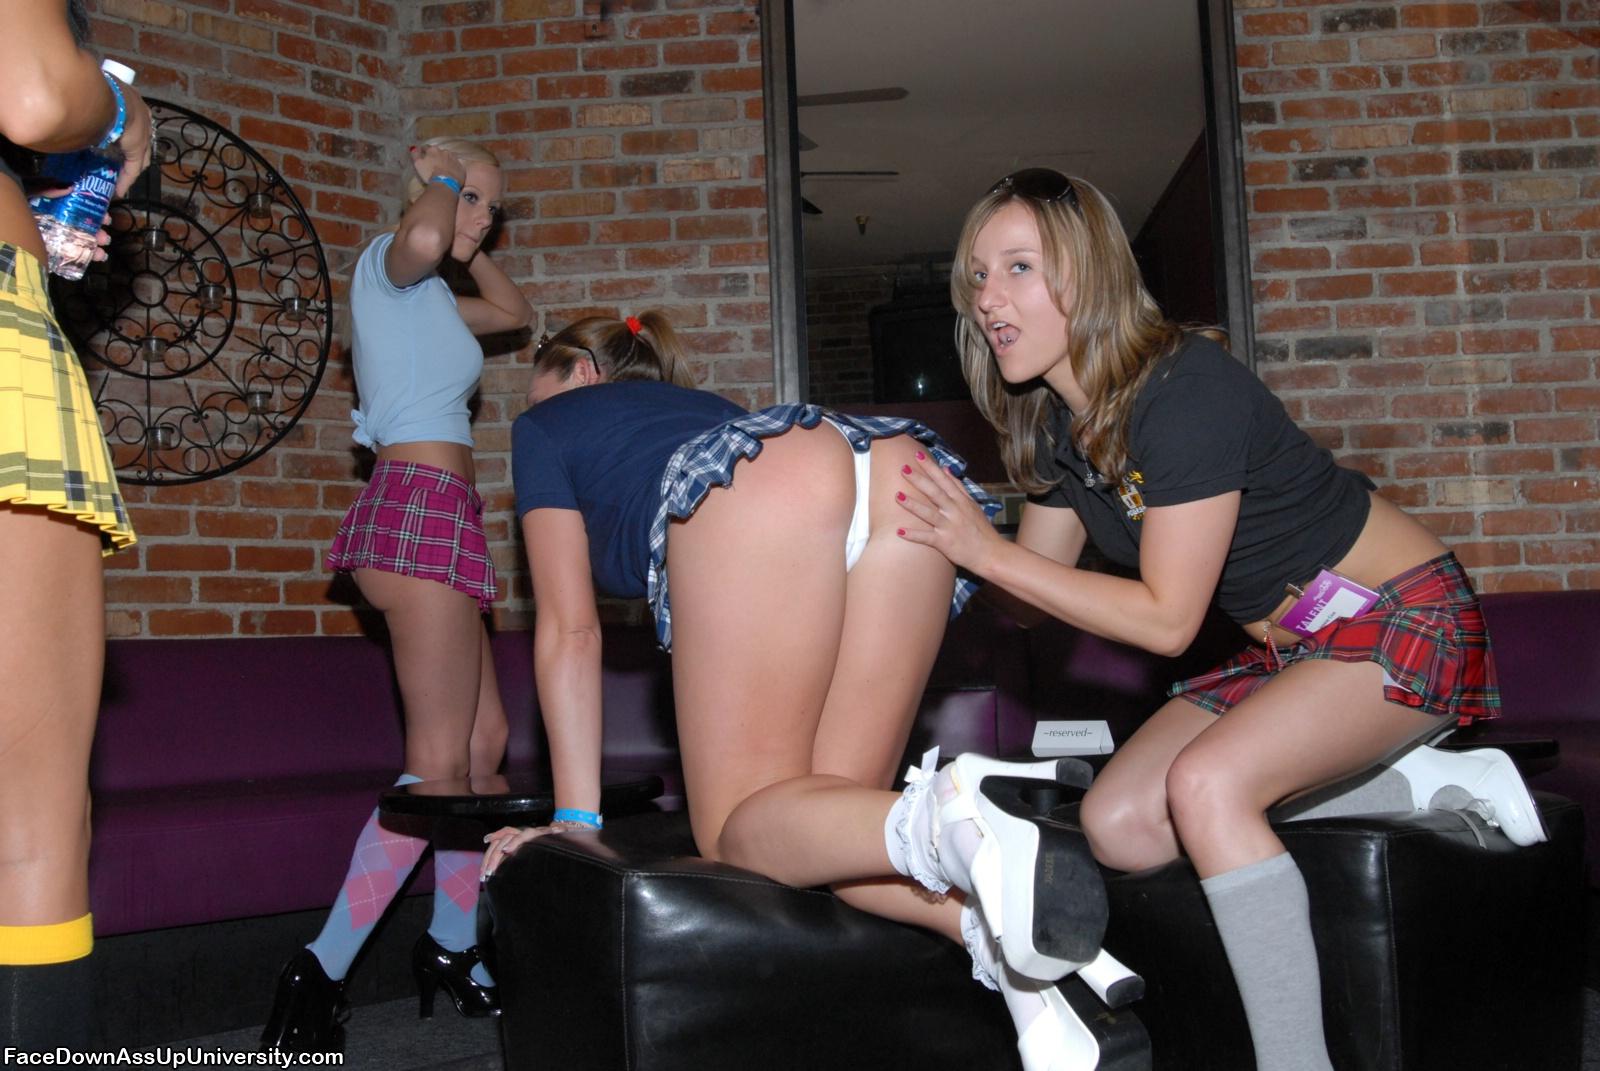 Free upskirt college girl porn galery